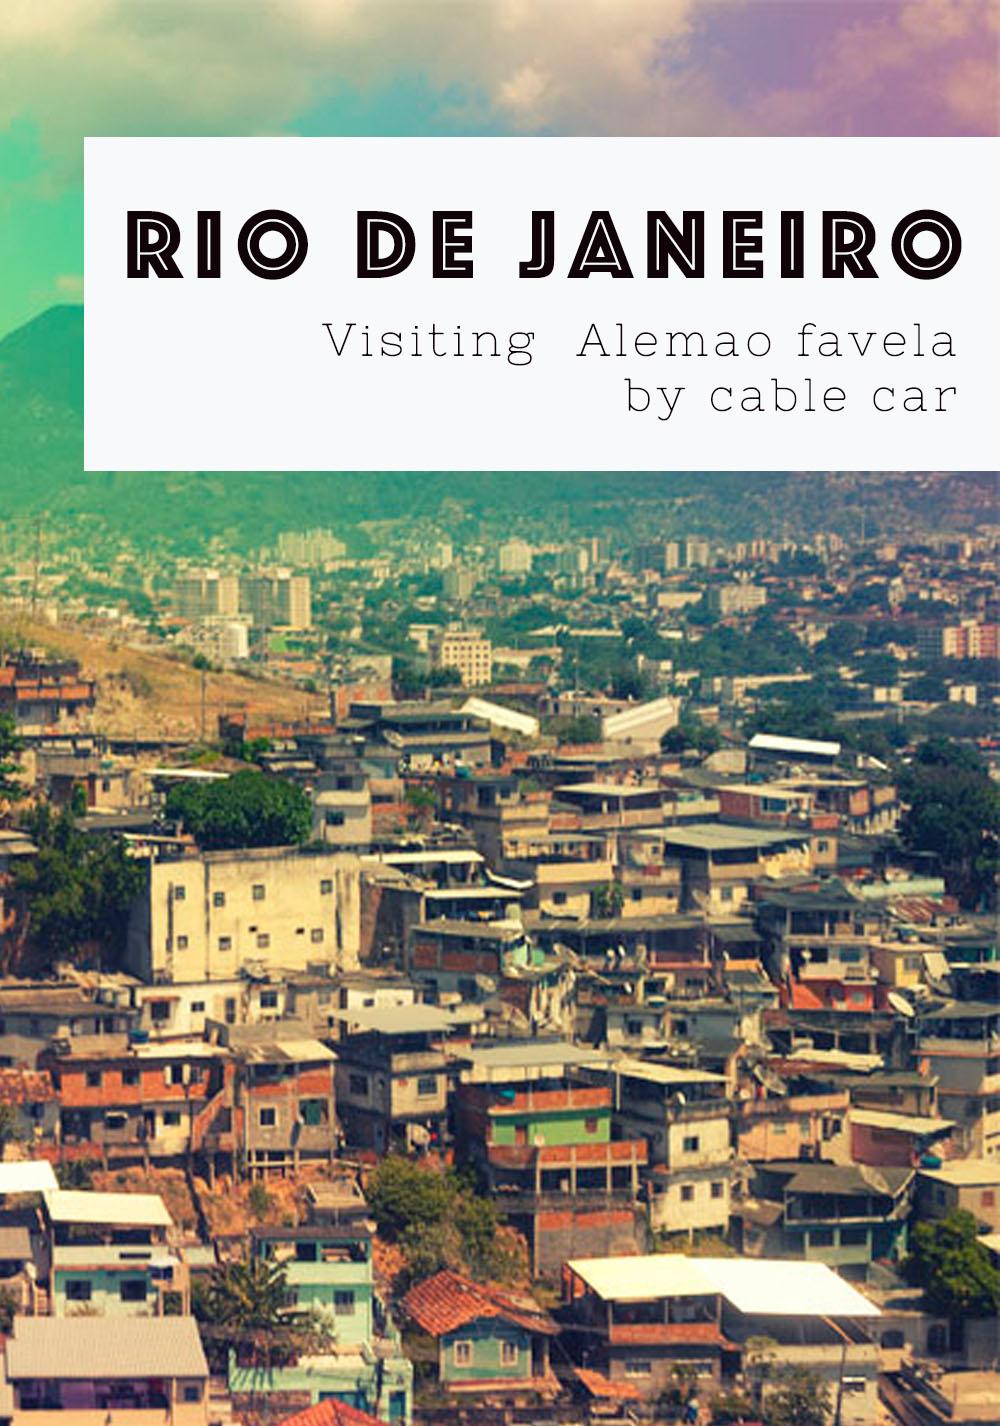 Visiting rio favela by cable car